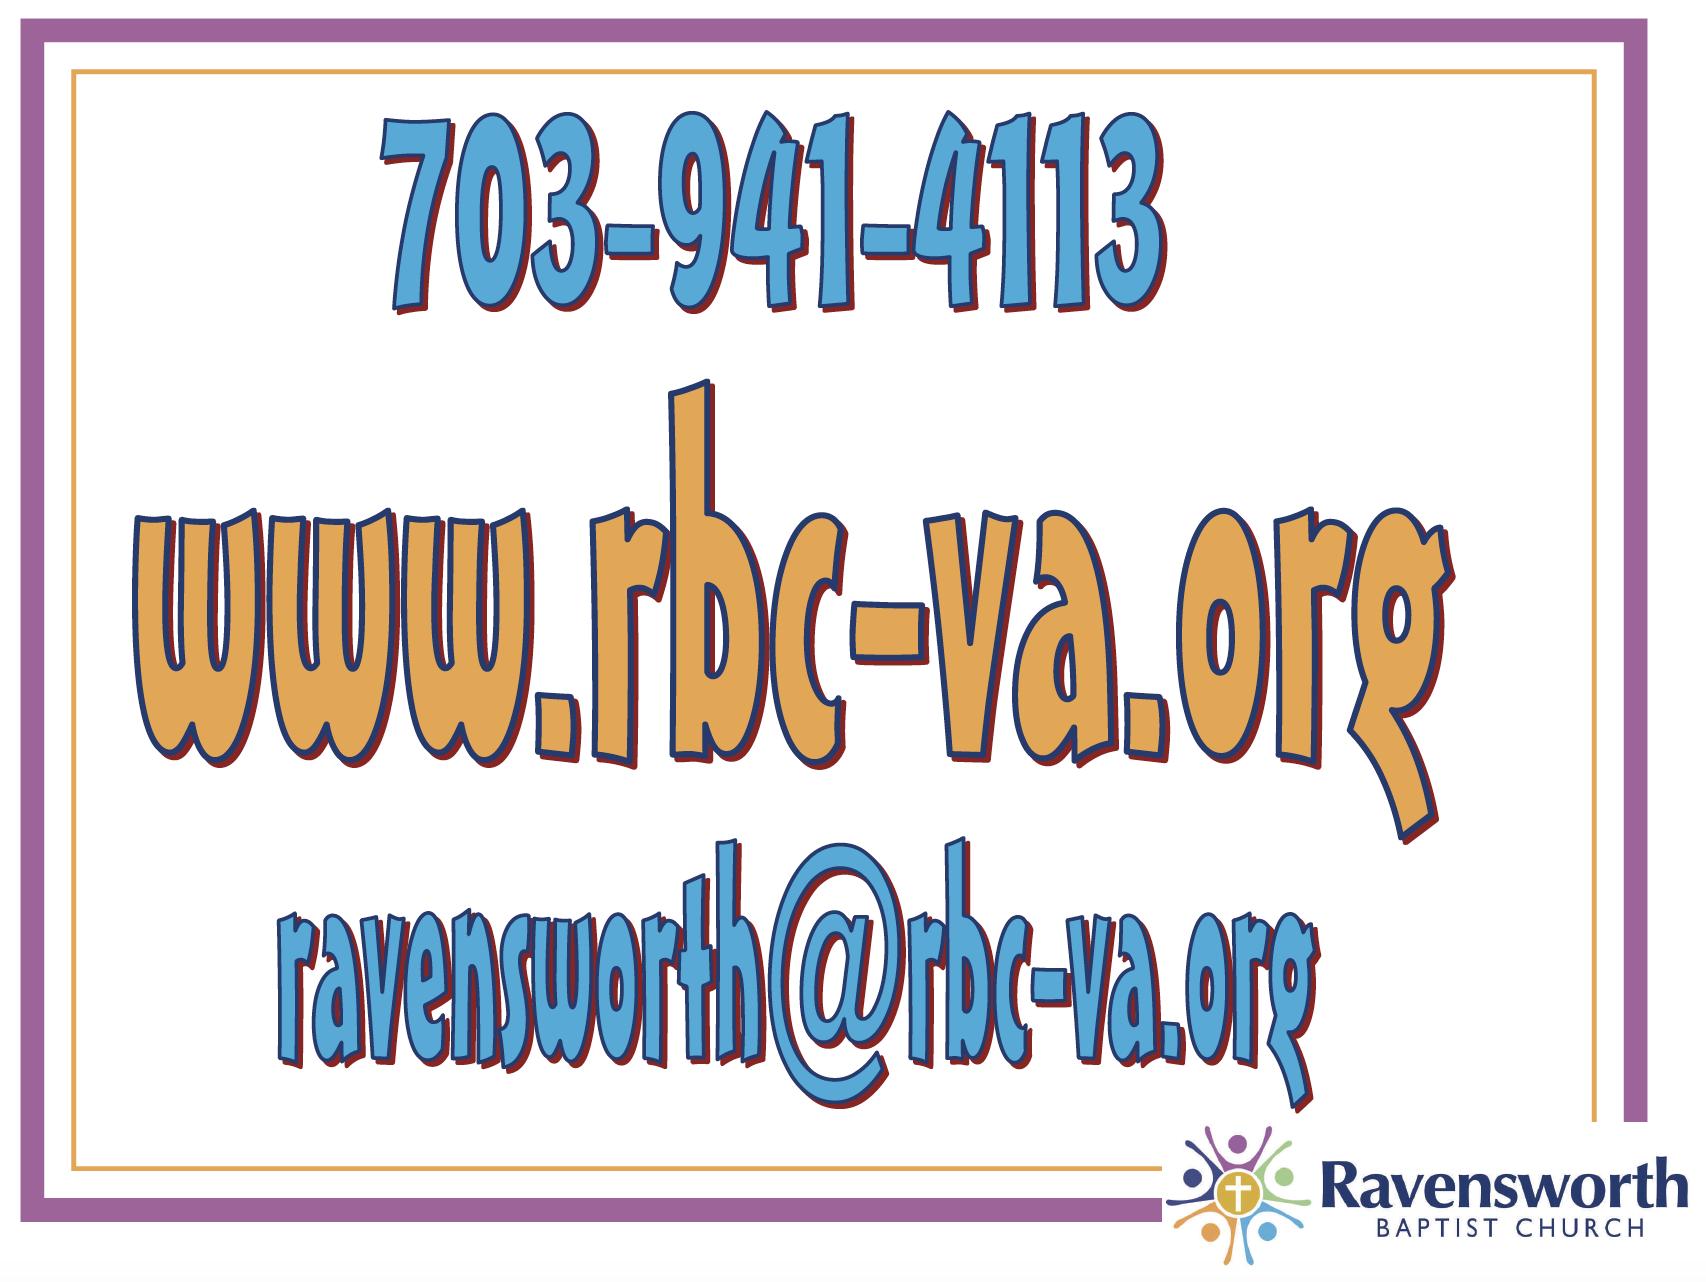 Ravensworth Vital Stats